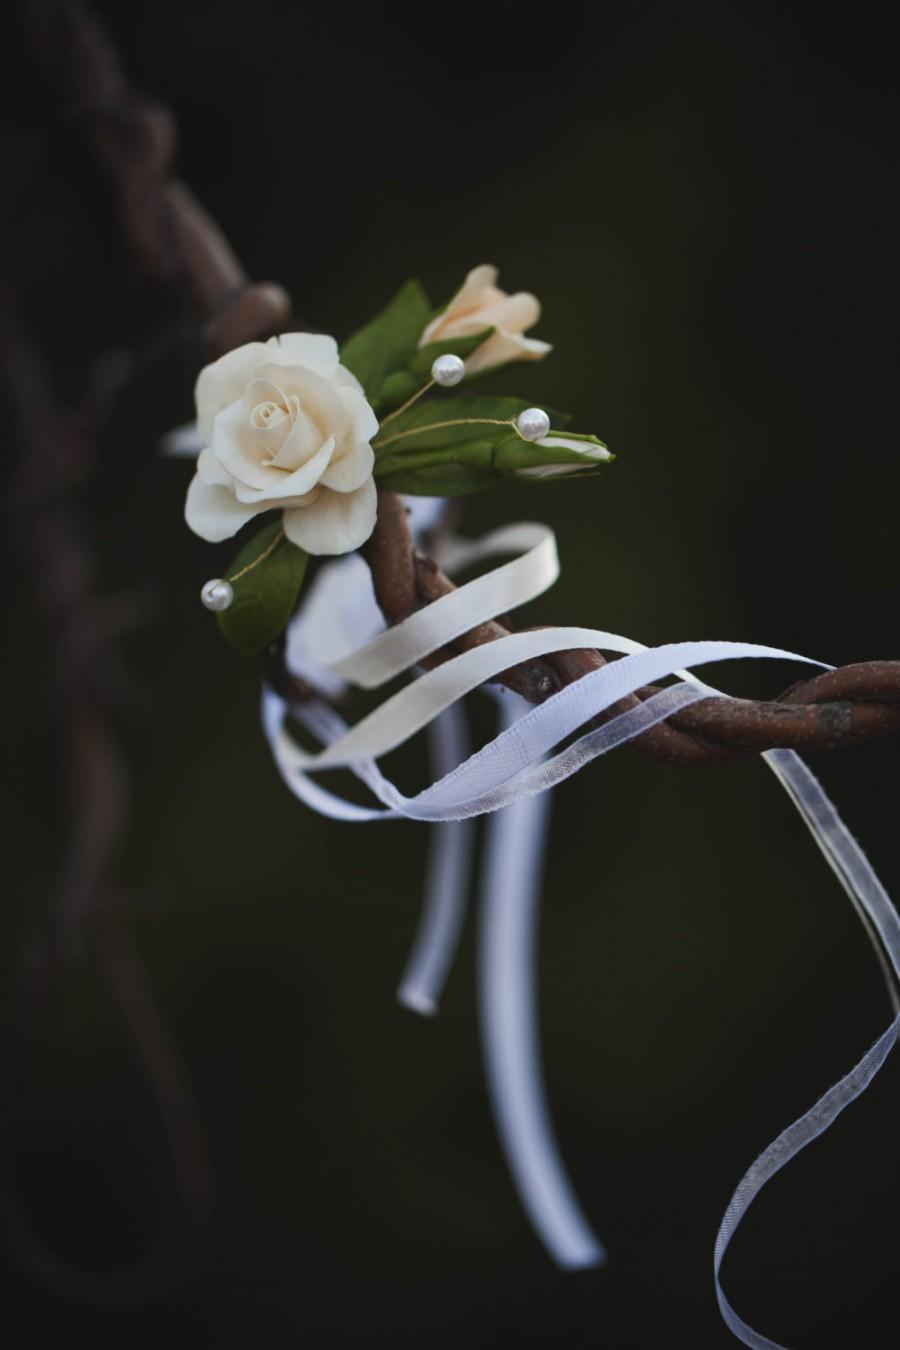 Mariage - Wedding Bracelet - Handmade Bracelet - Rose Bracelet - Floral Bracelet - Cold Porcelain Bracelet - Flower Bracelet